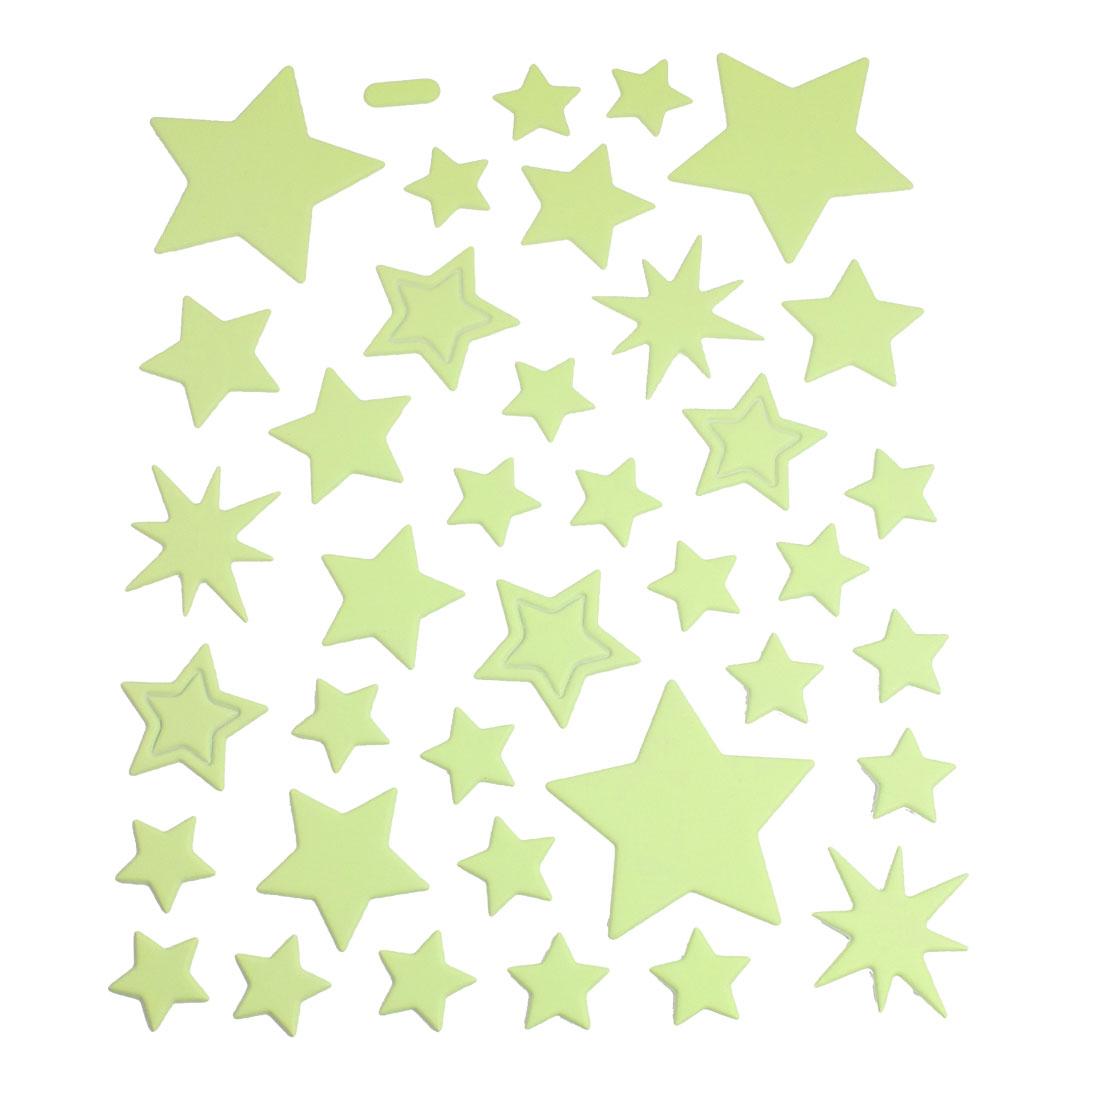 37 Pcs Light Green Black Star Shape Decorative Luminous Sticker Decal Decor